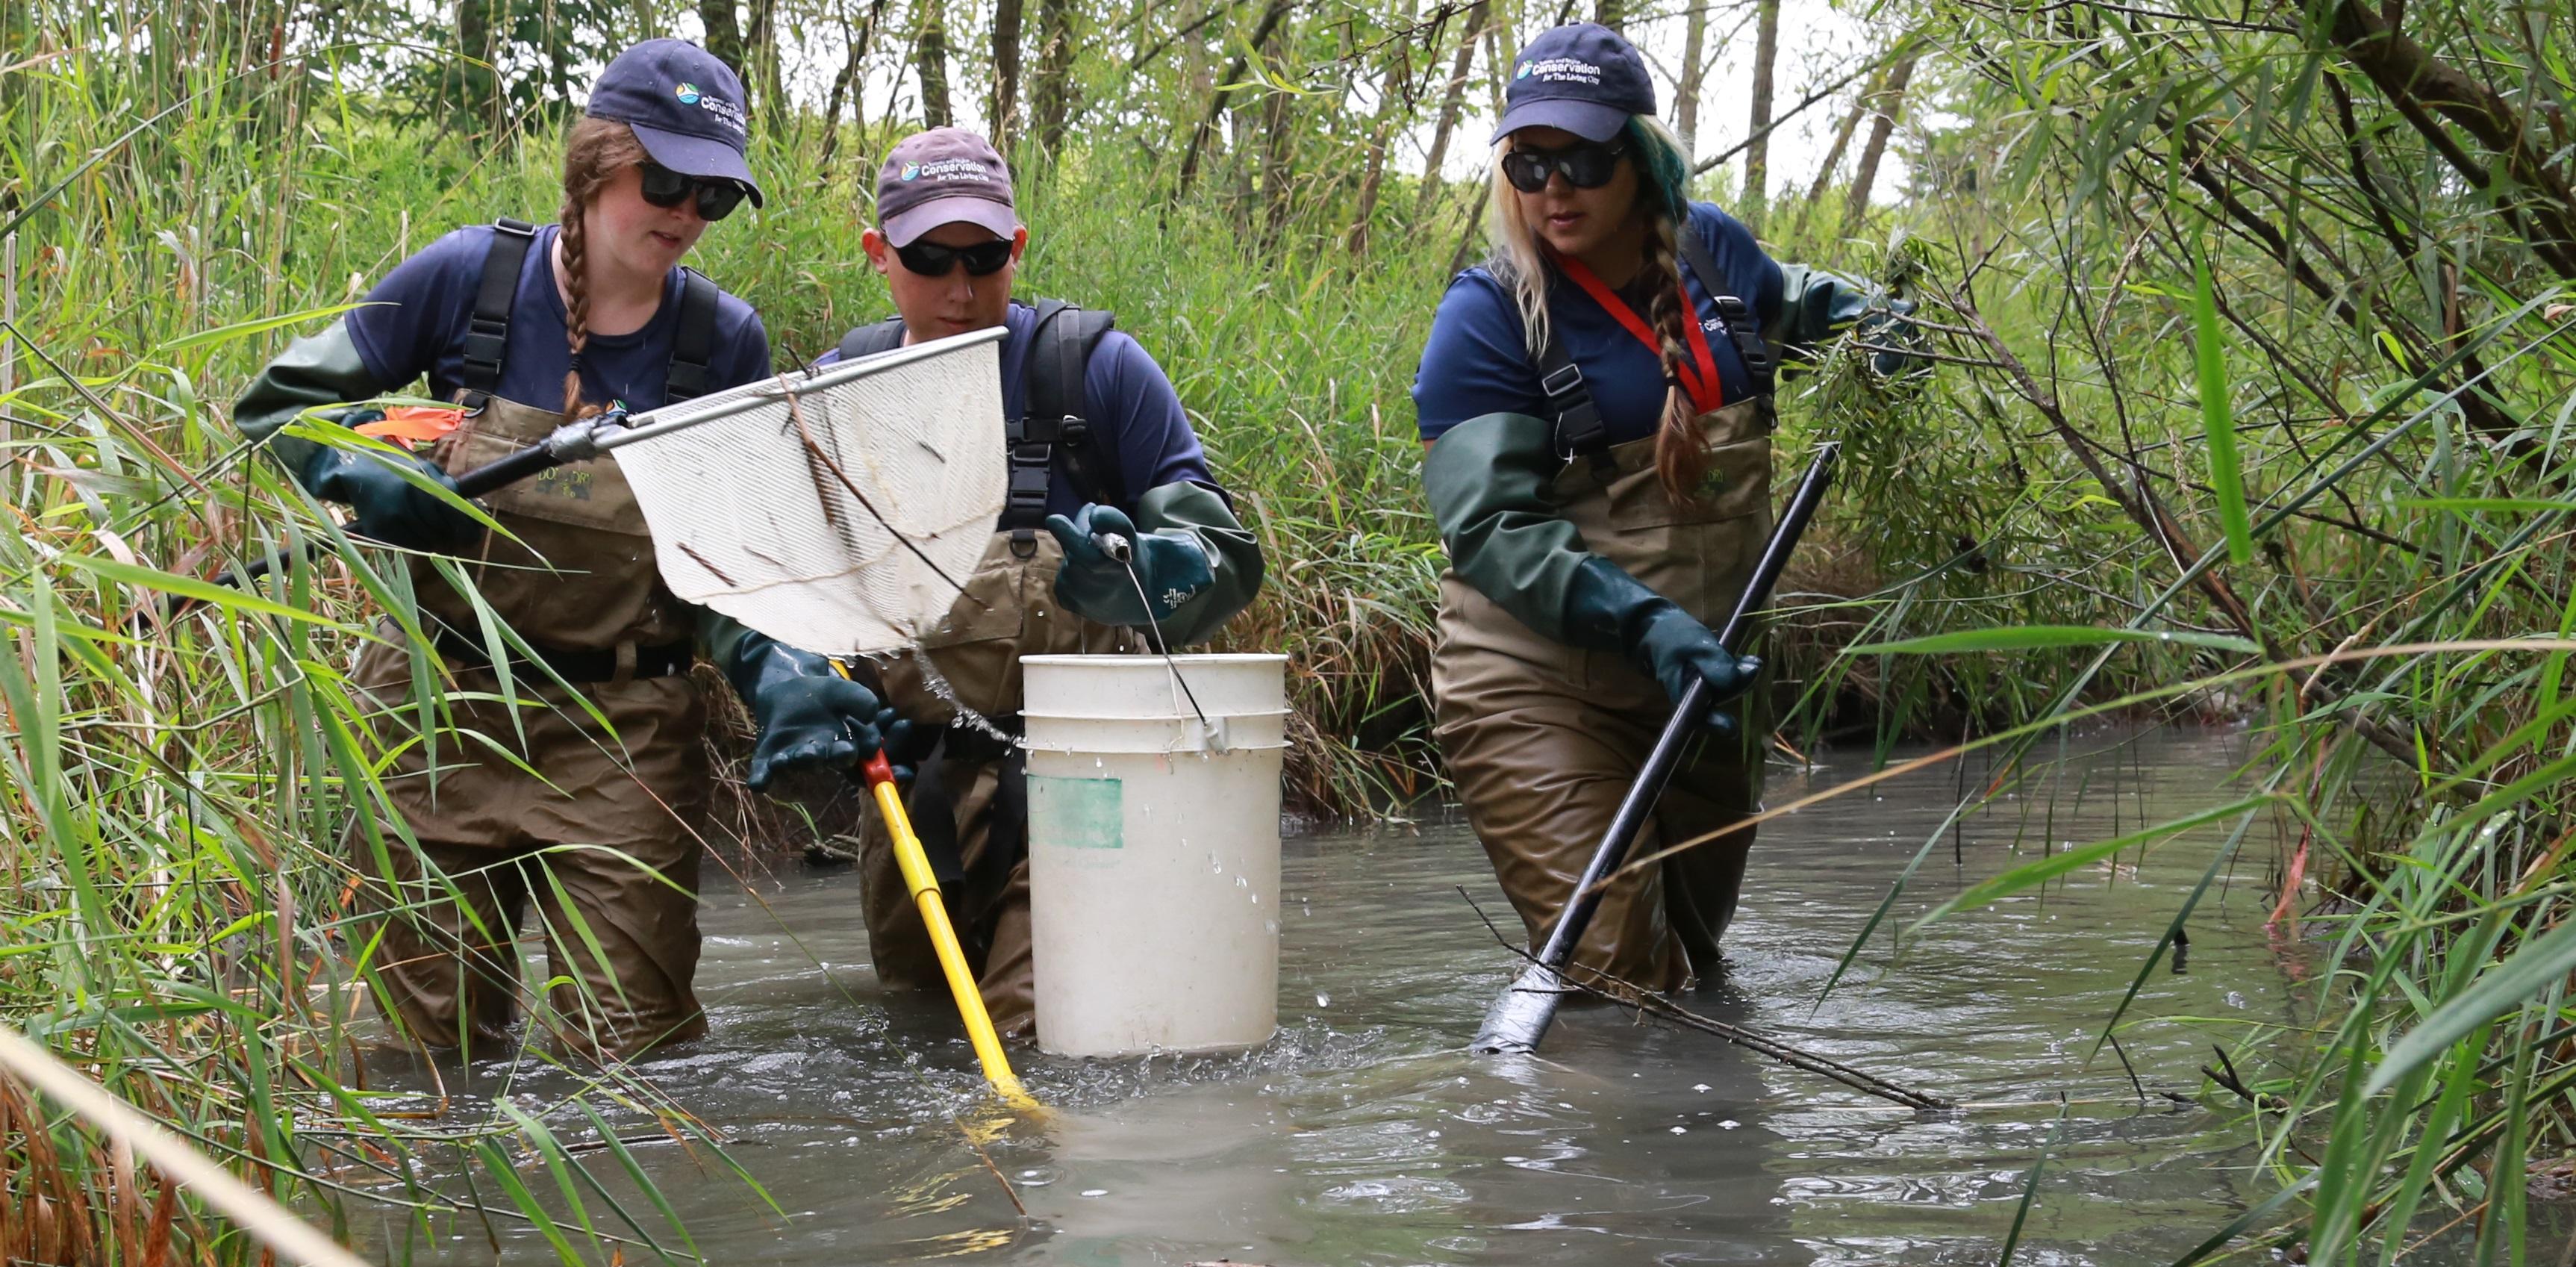 TRCA staff monitor aquatic life in a local stream